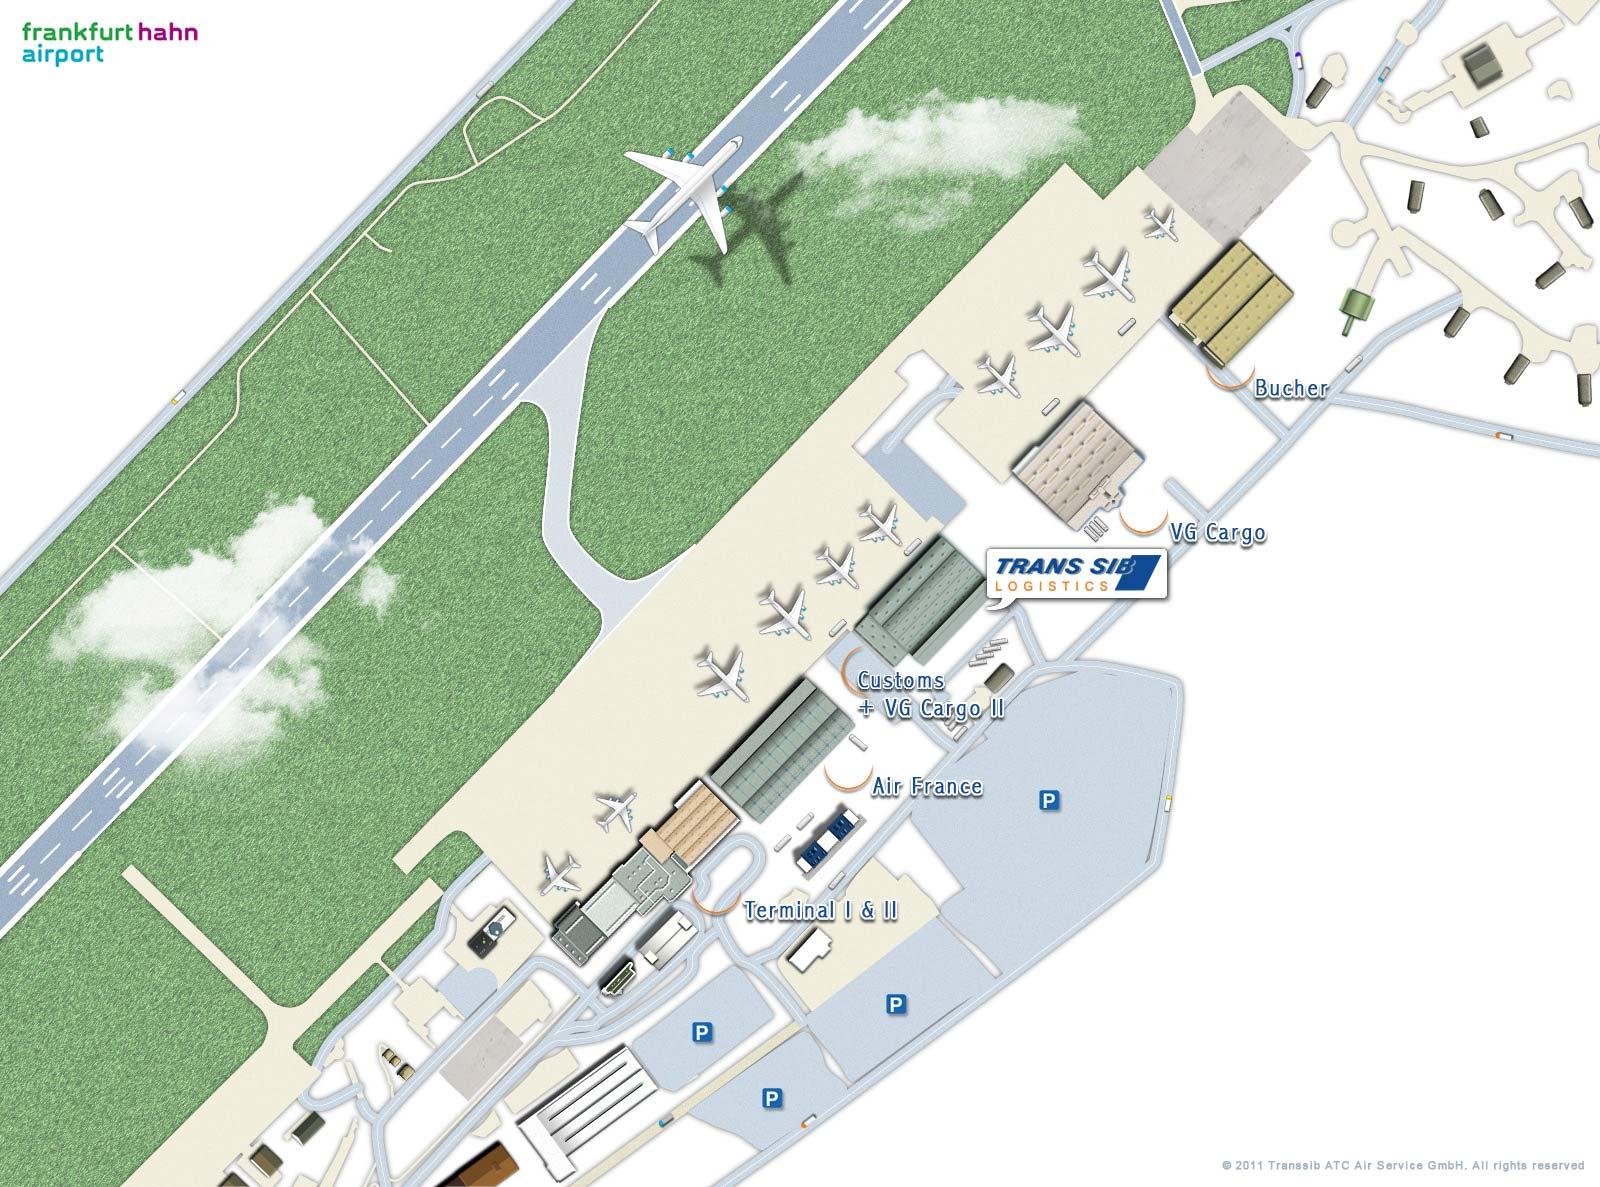 Hotel ibis Frankfurt Airport. Book now! 24-hour Services!